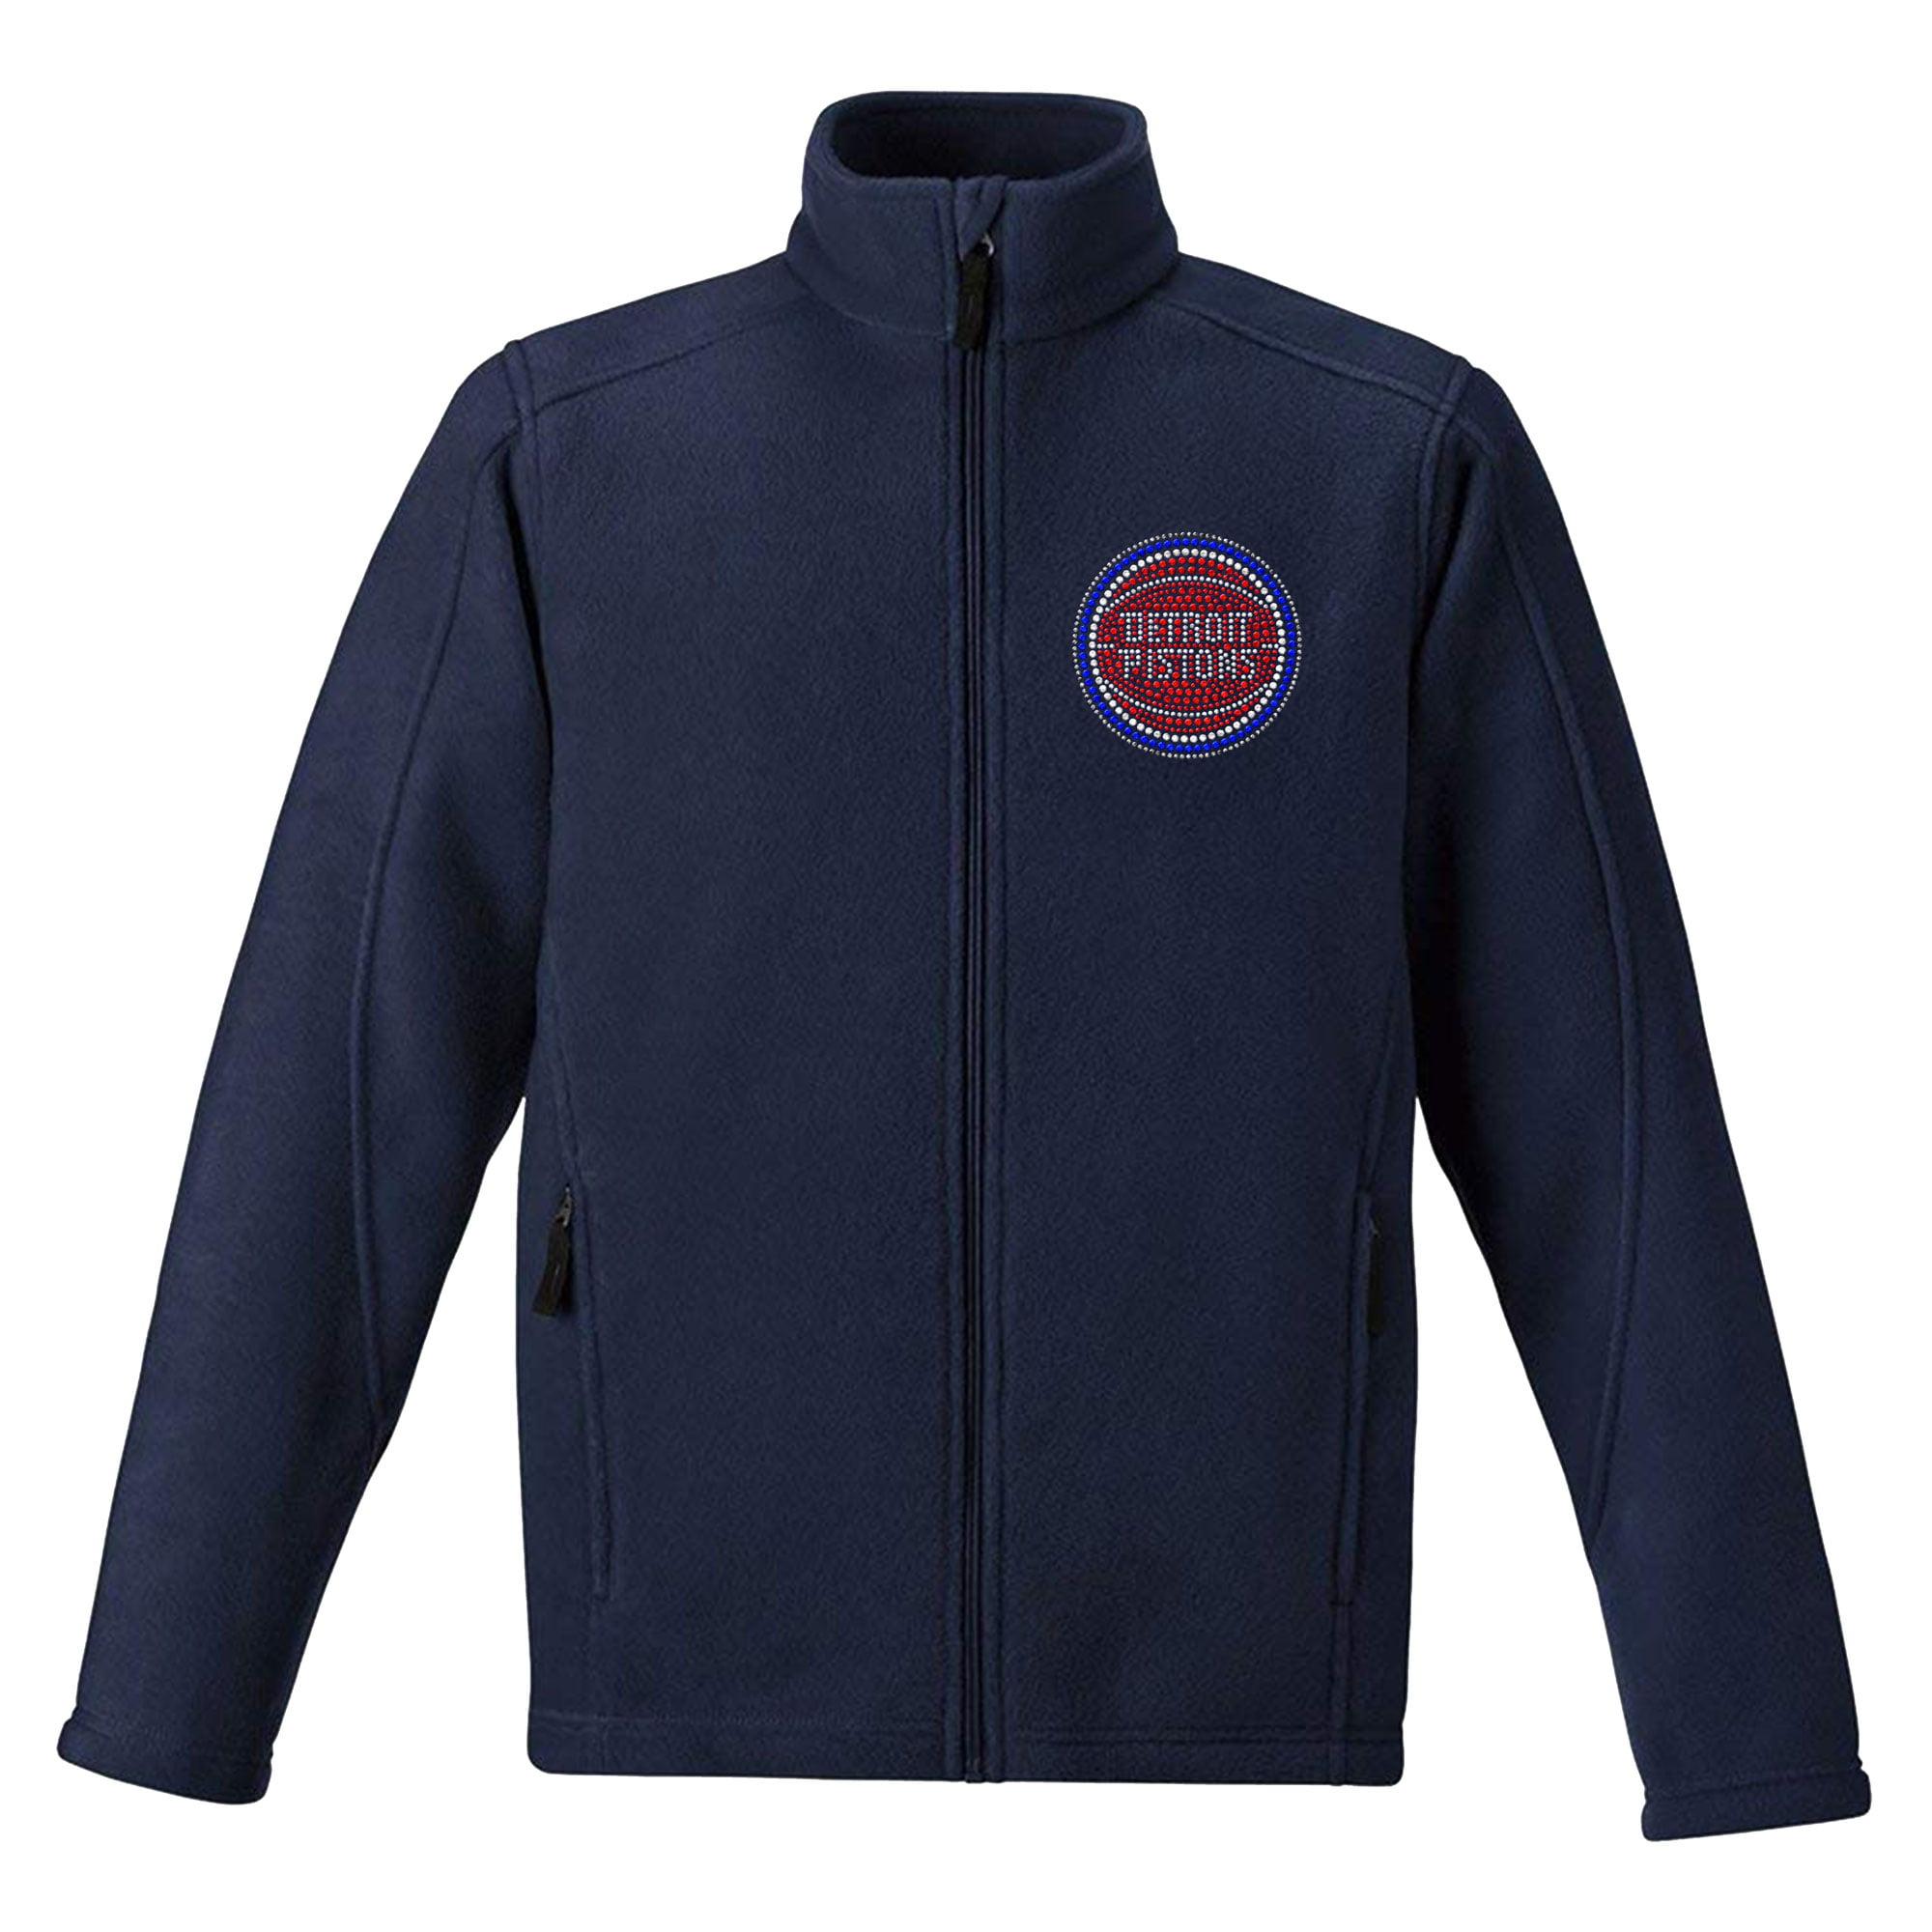 Detroit Pistons Women's Rhinestone Full-Zip Fleece Jacket - Navy